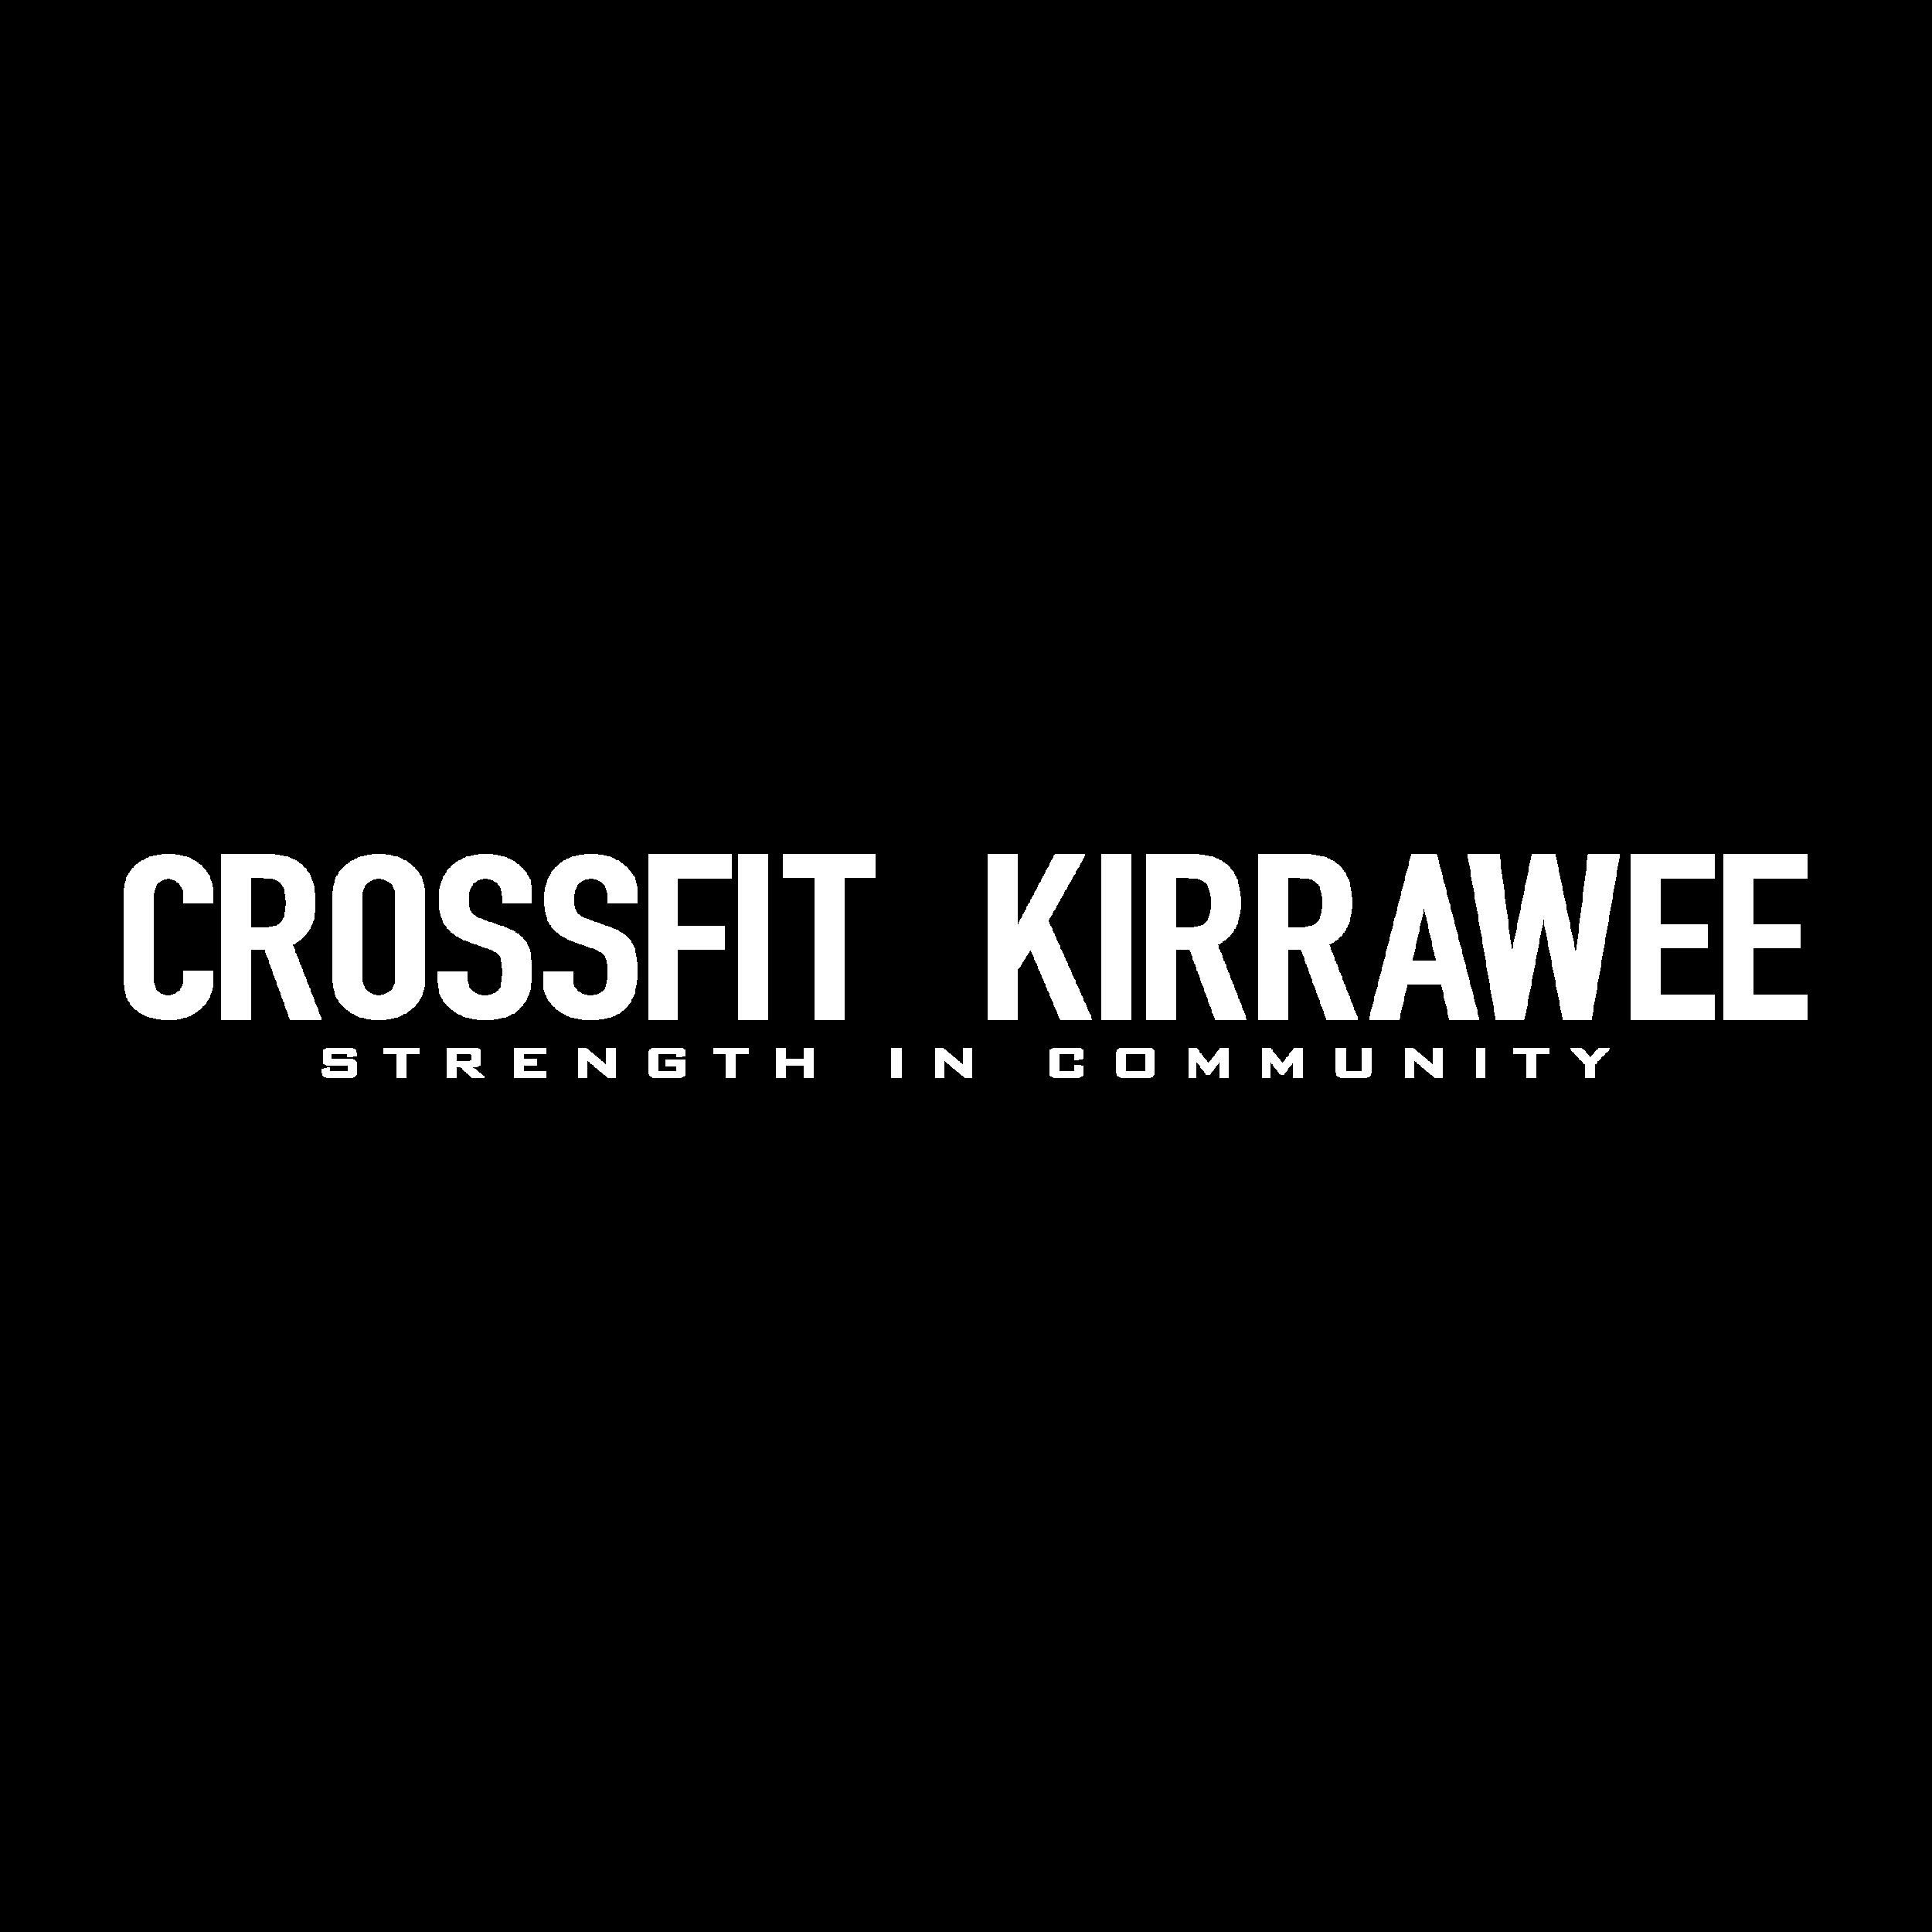 3065_CrossFit Kirrawee_C_04.png